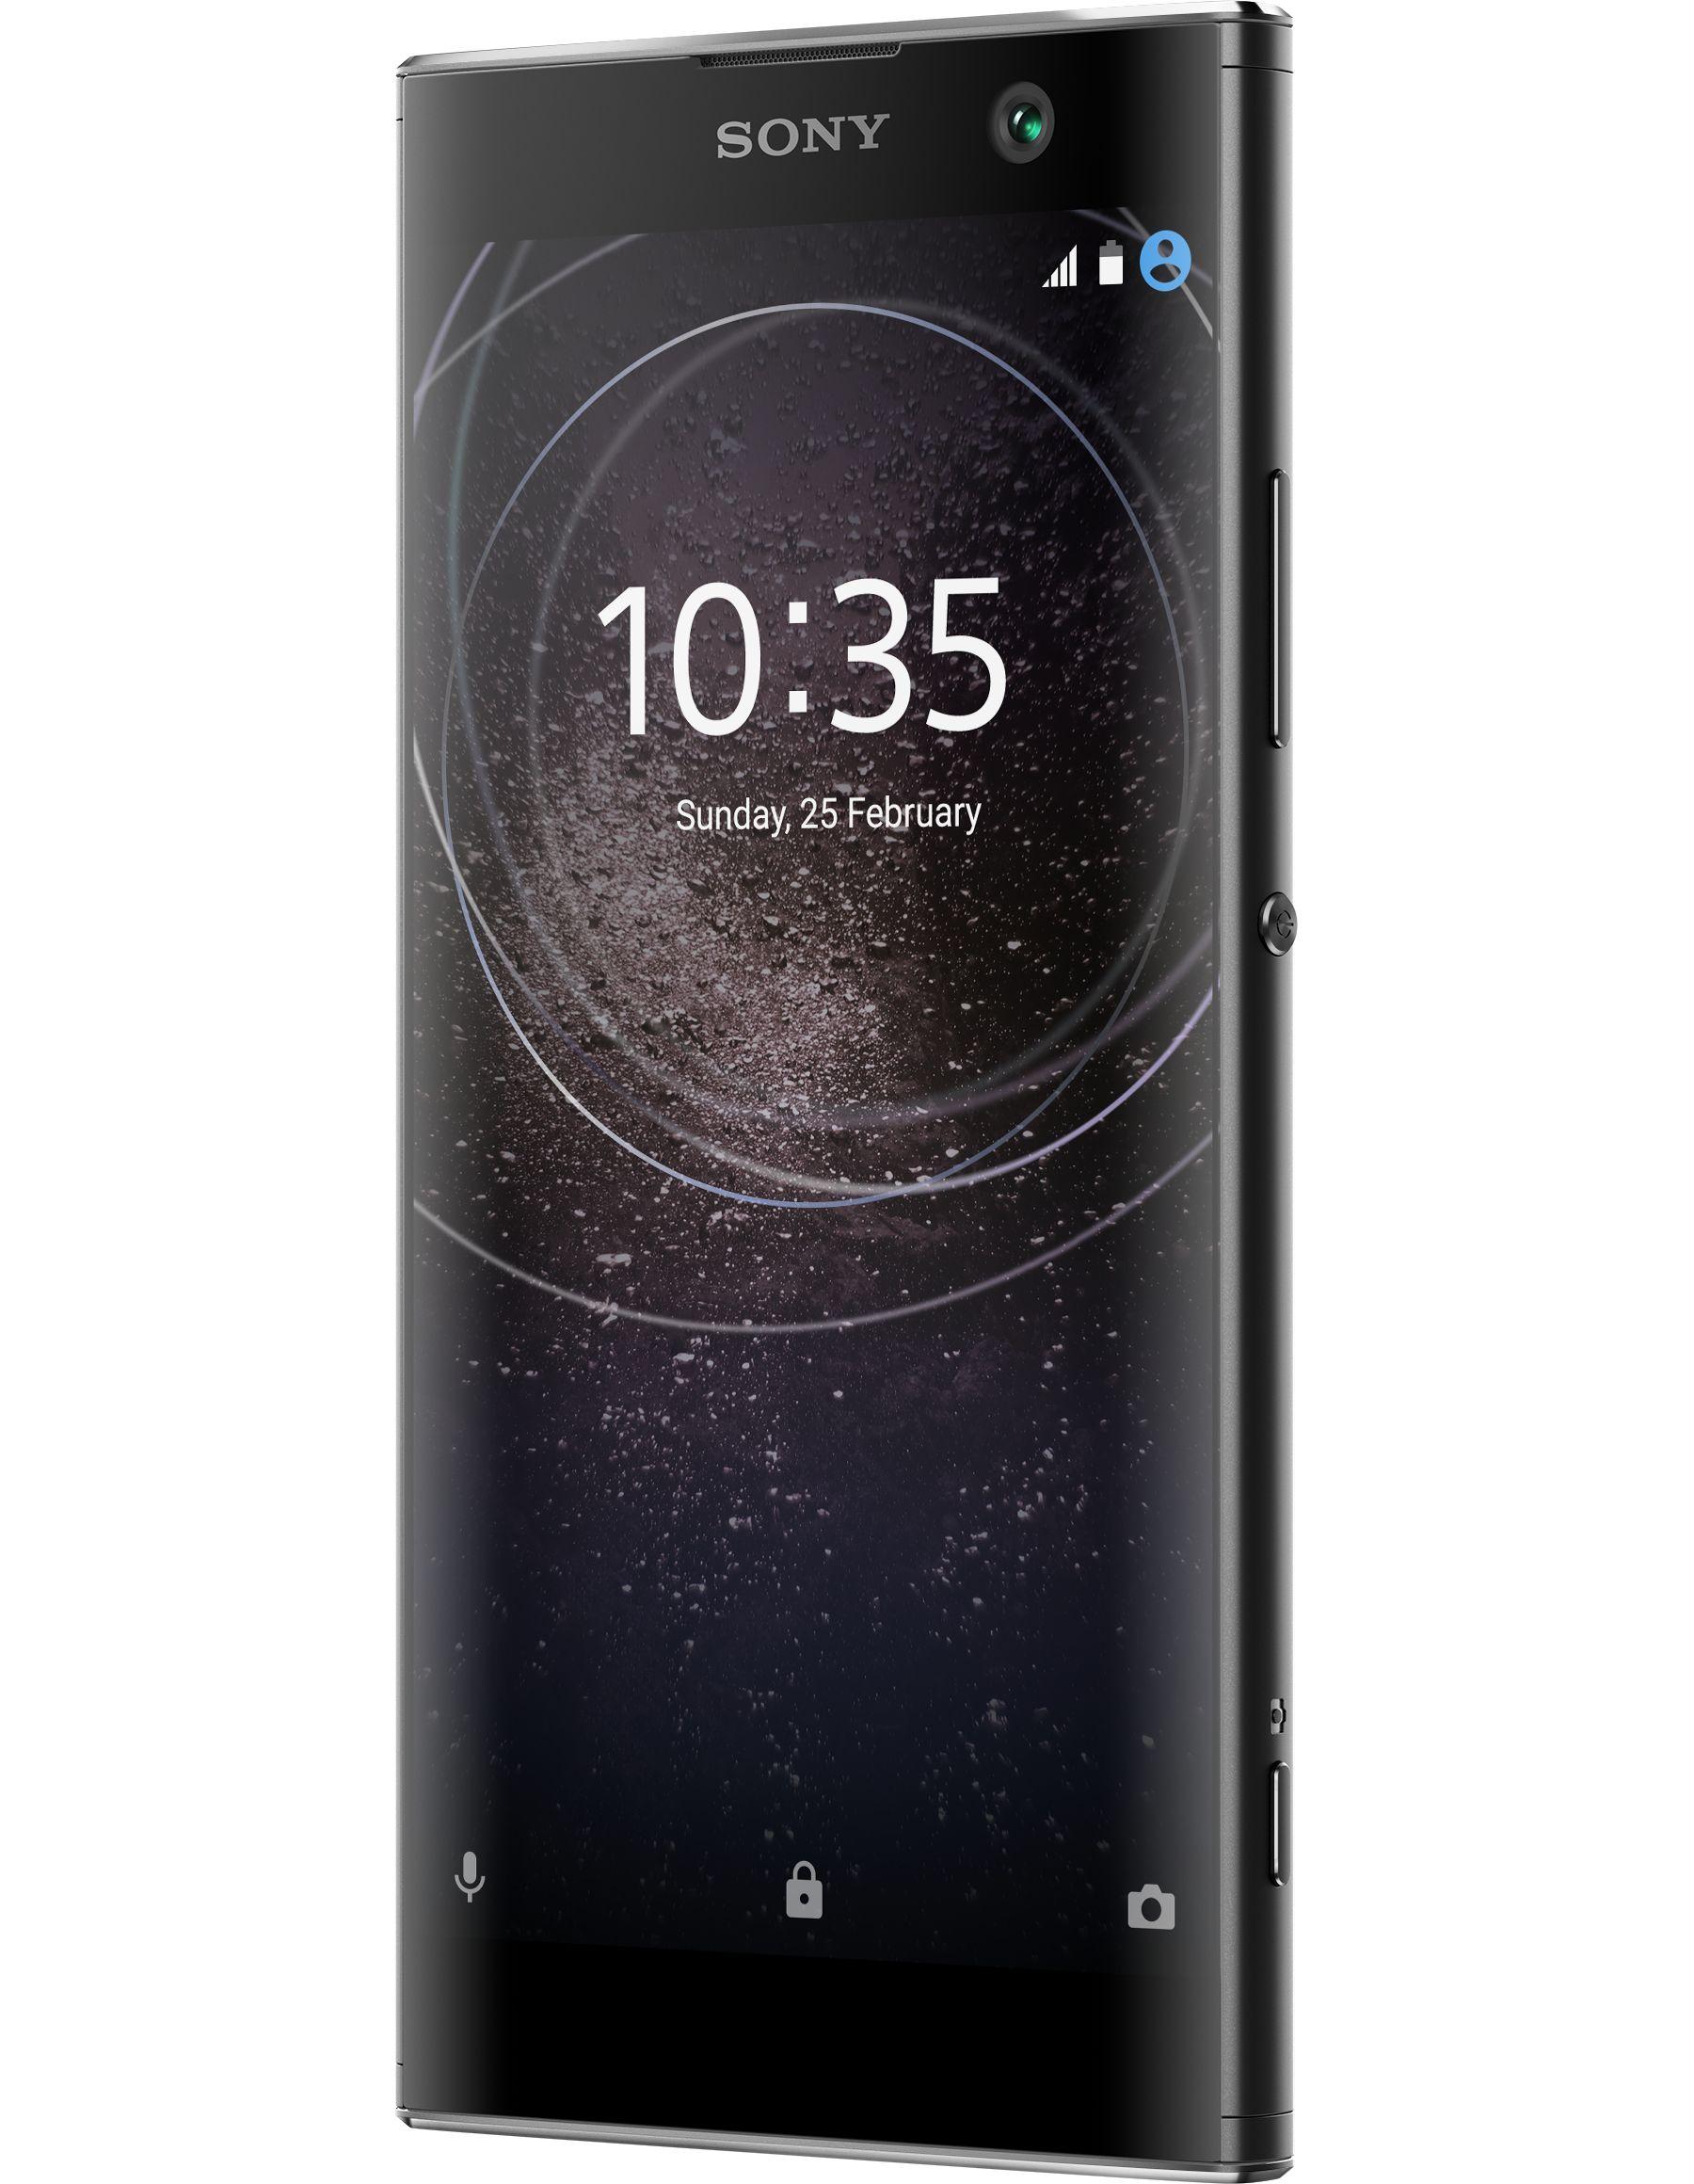 Sony Xperia XA2 Refurb Good £135.99 / Excellent £143.99 / Pristine £151.99 @ Envirofone